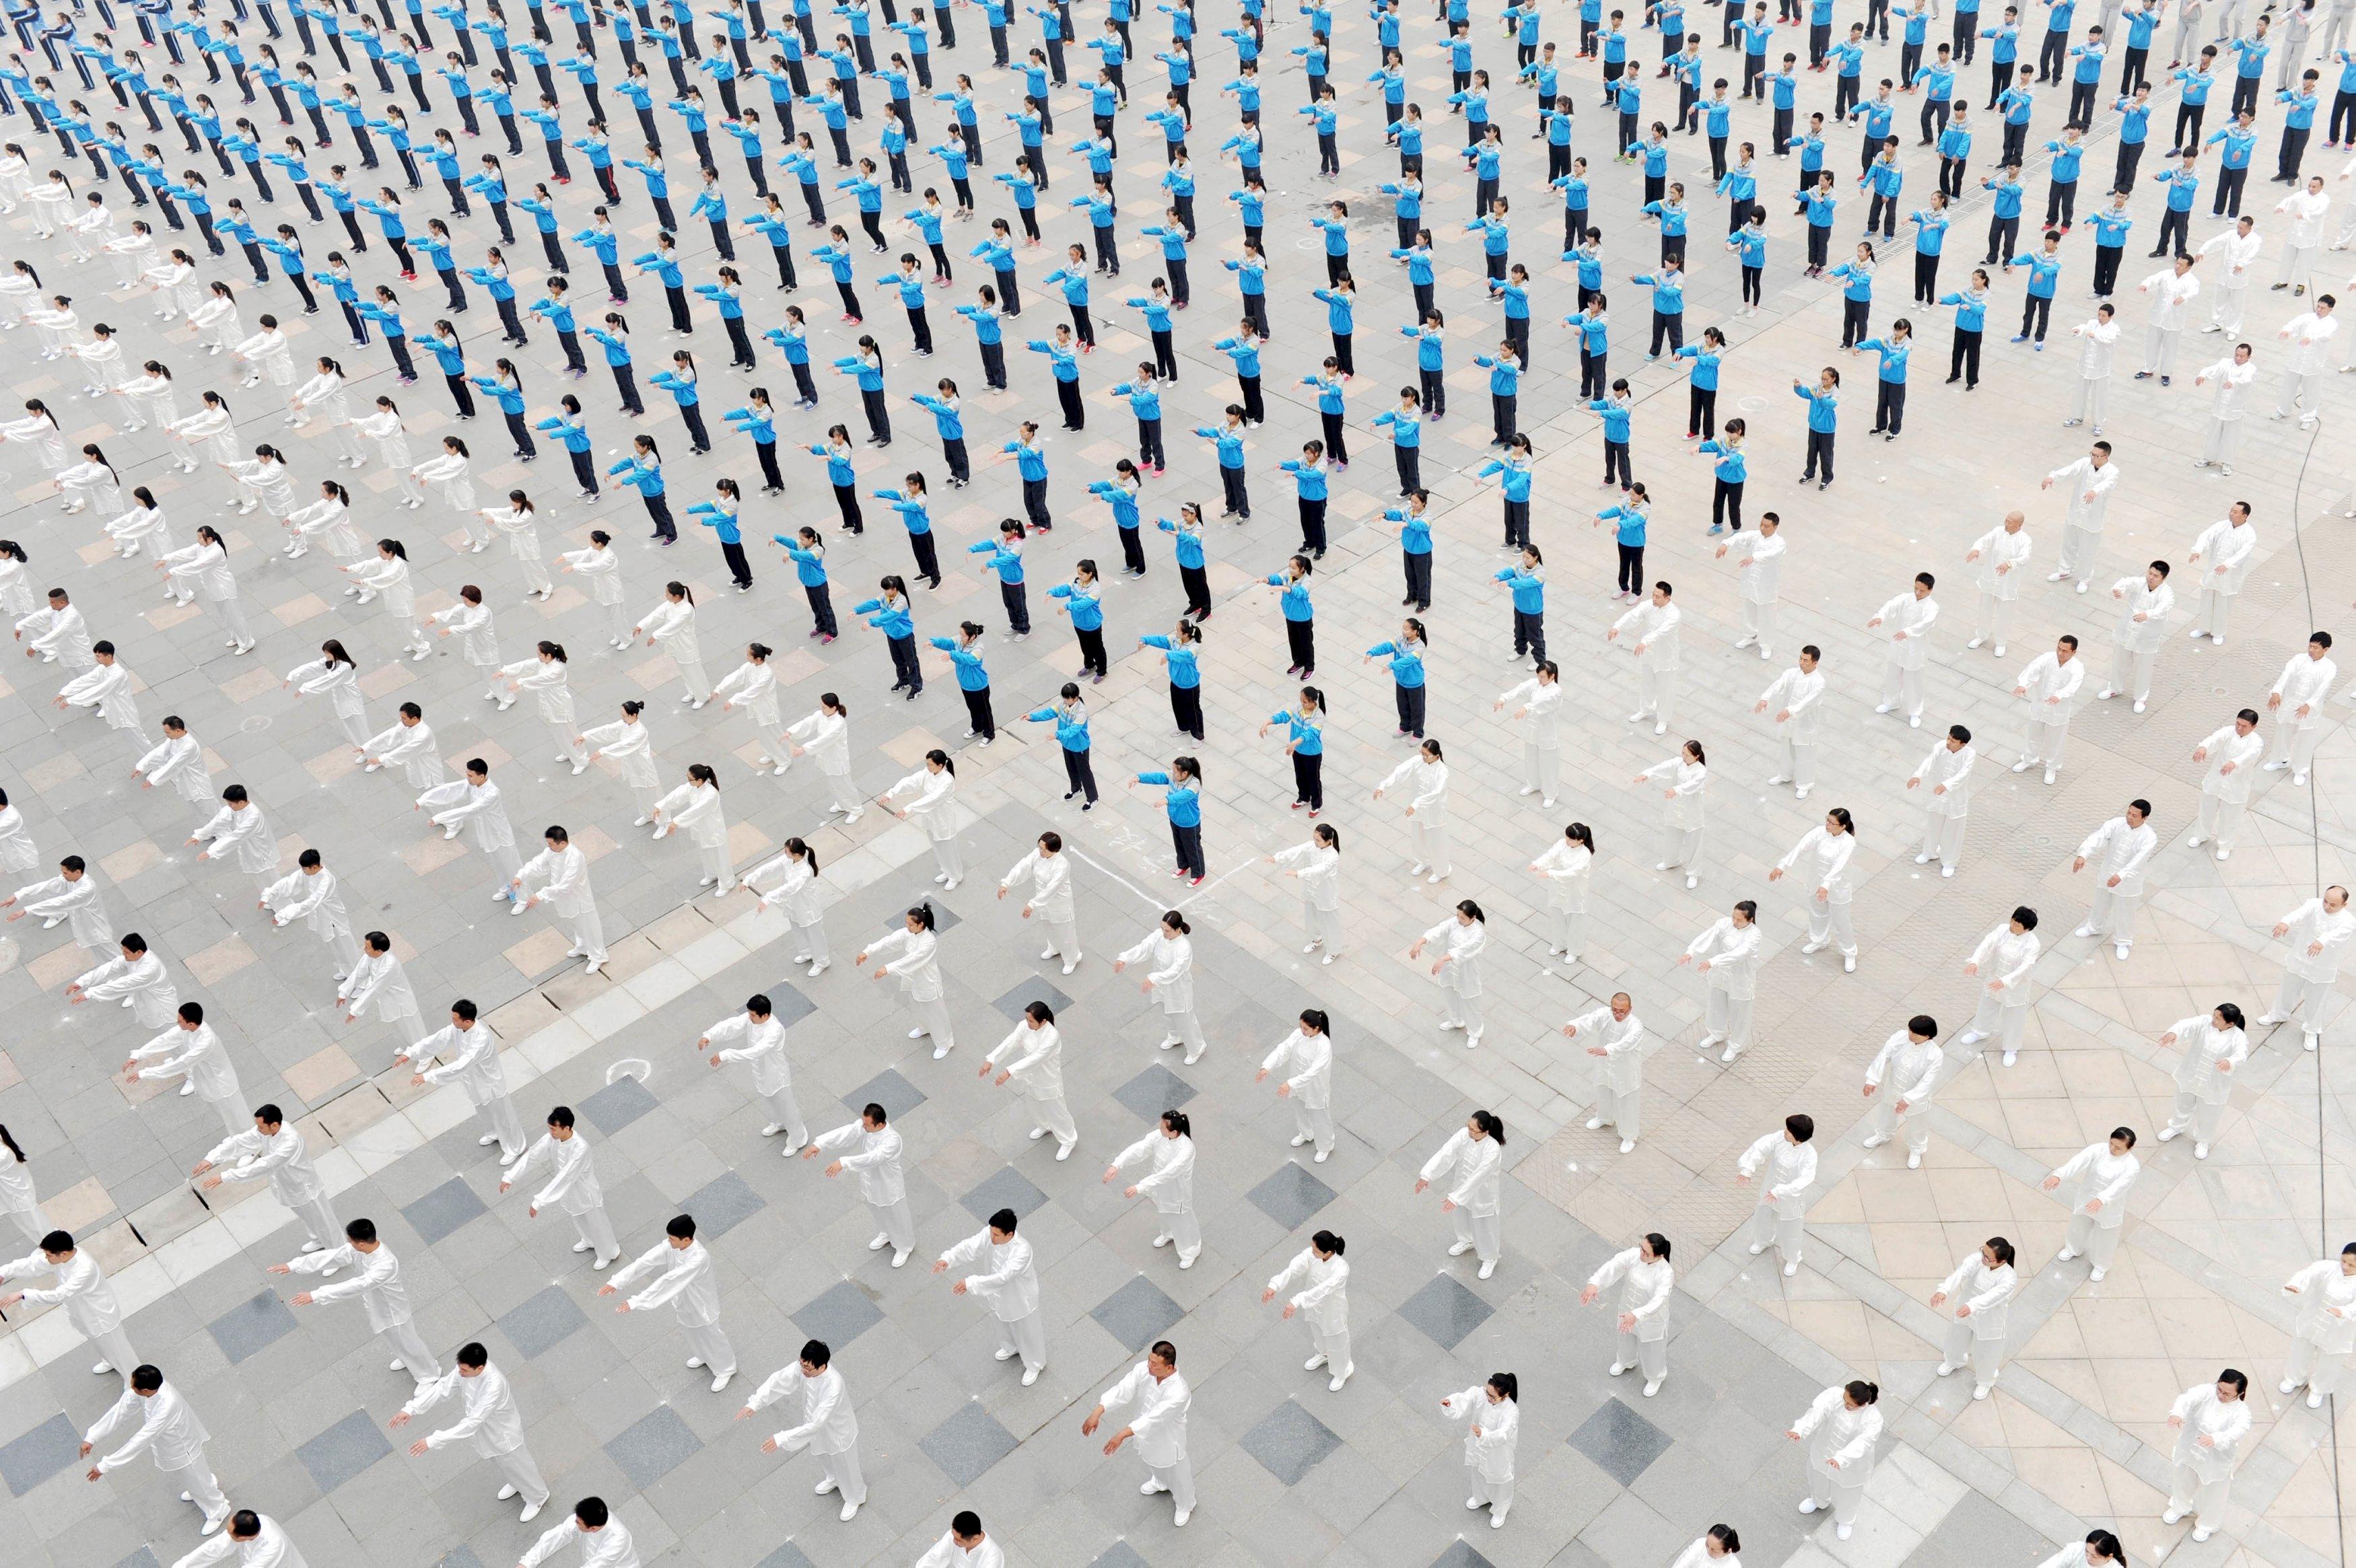 Orang-orang berlatih Taichi di sebuah lapangan di Qinyang, Provinsi Henan, Tiongkok, 18 Oktober 2015. ANTARA FOTO/REUTERS/China Daily.